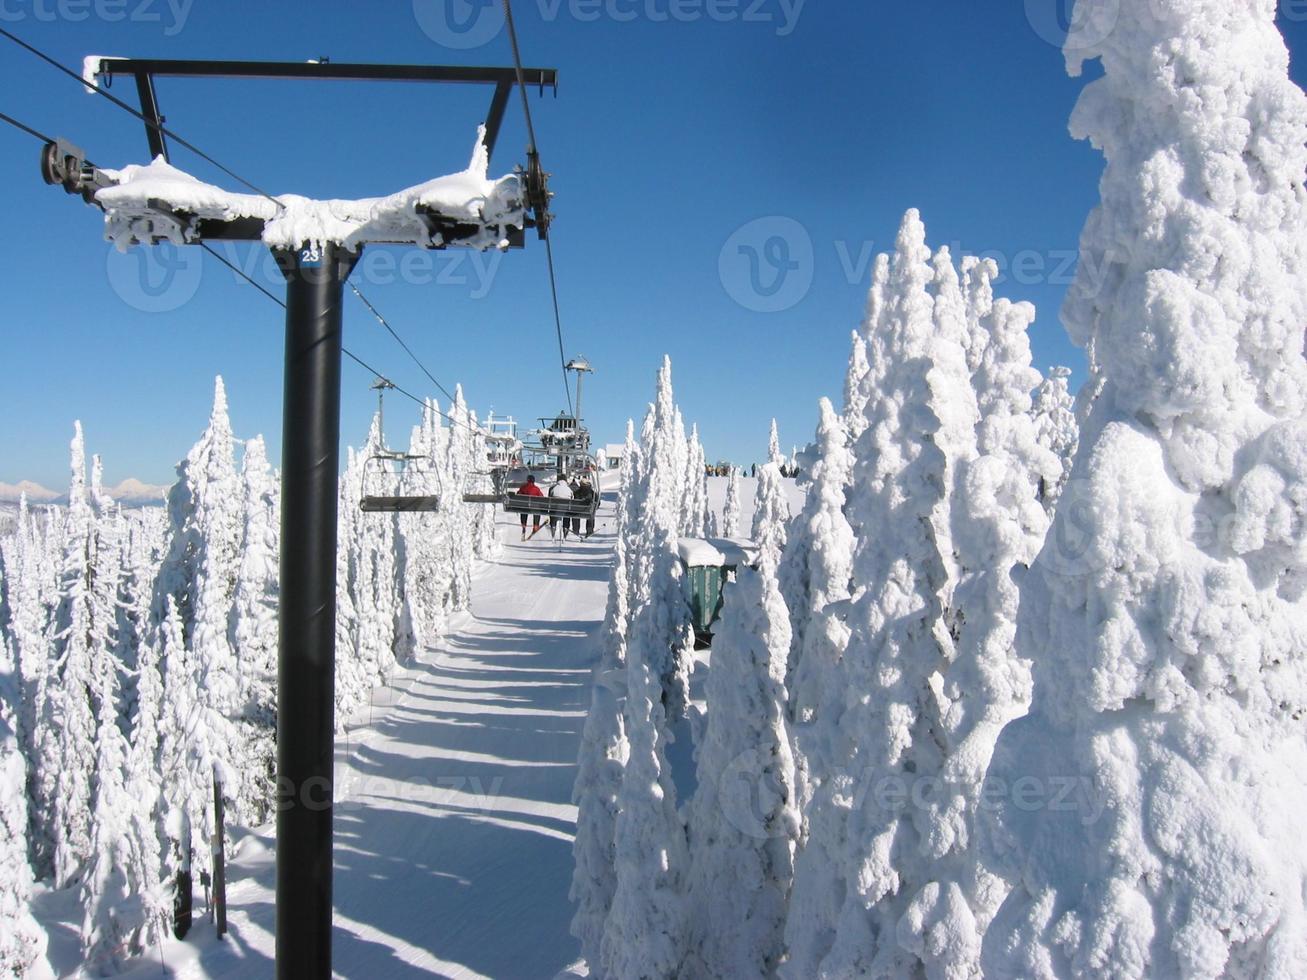 fantastische dag om te skiën foto